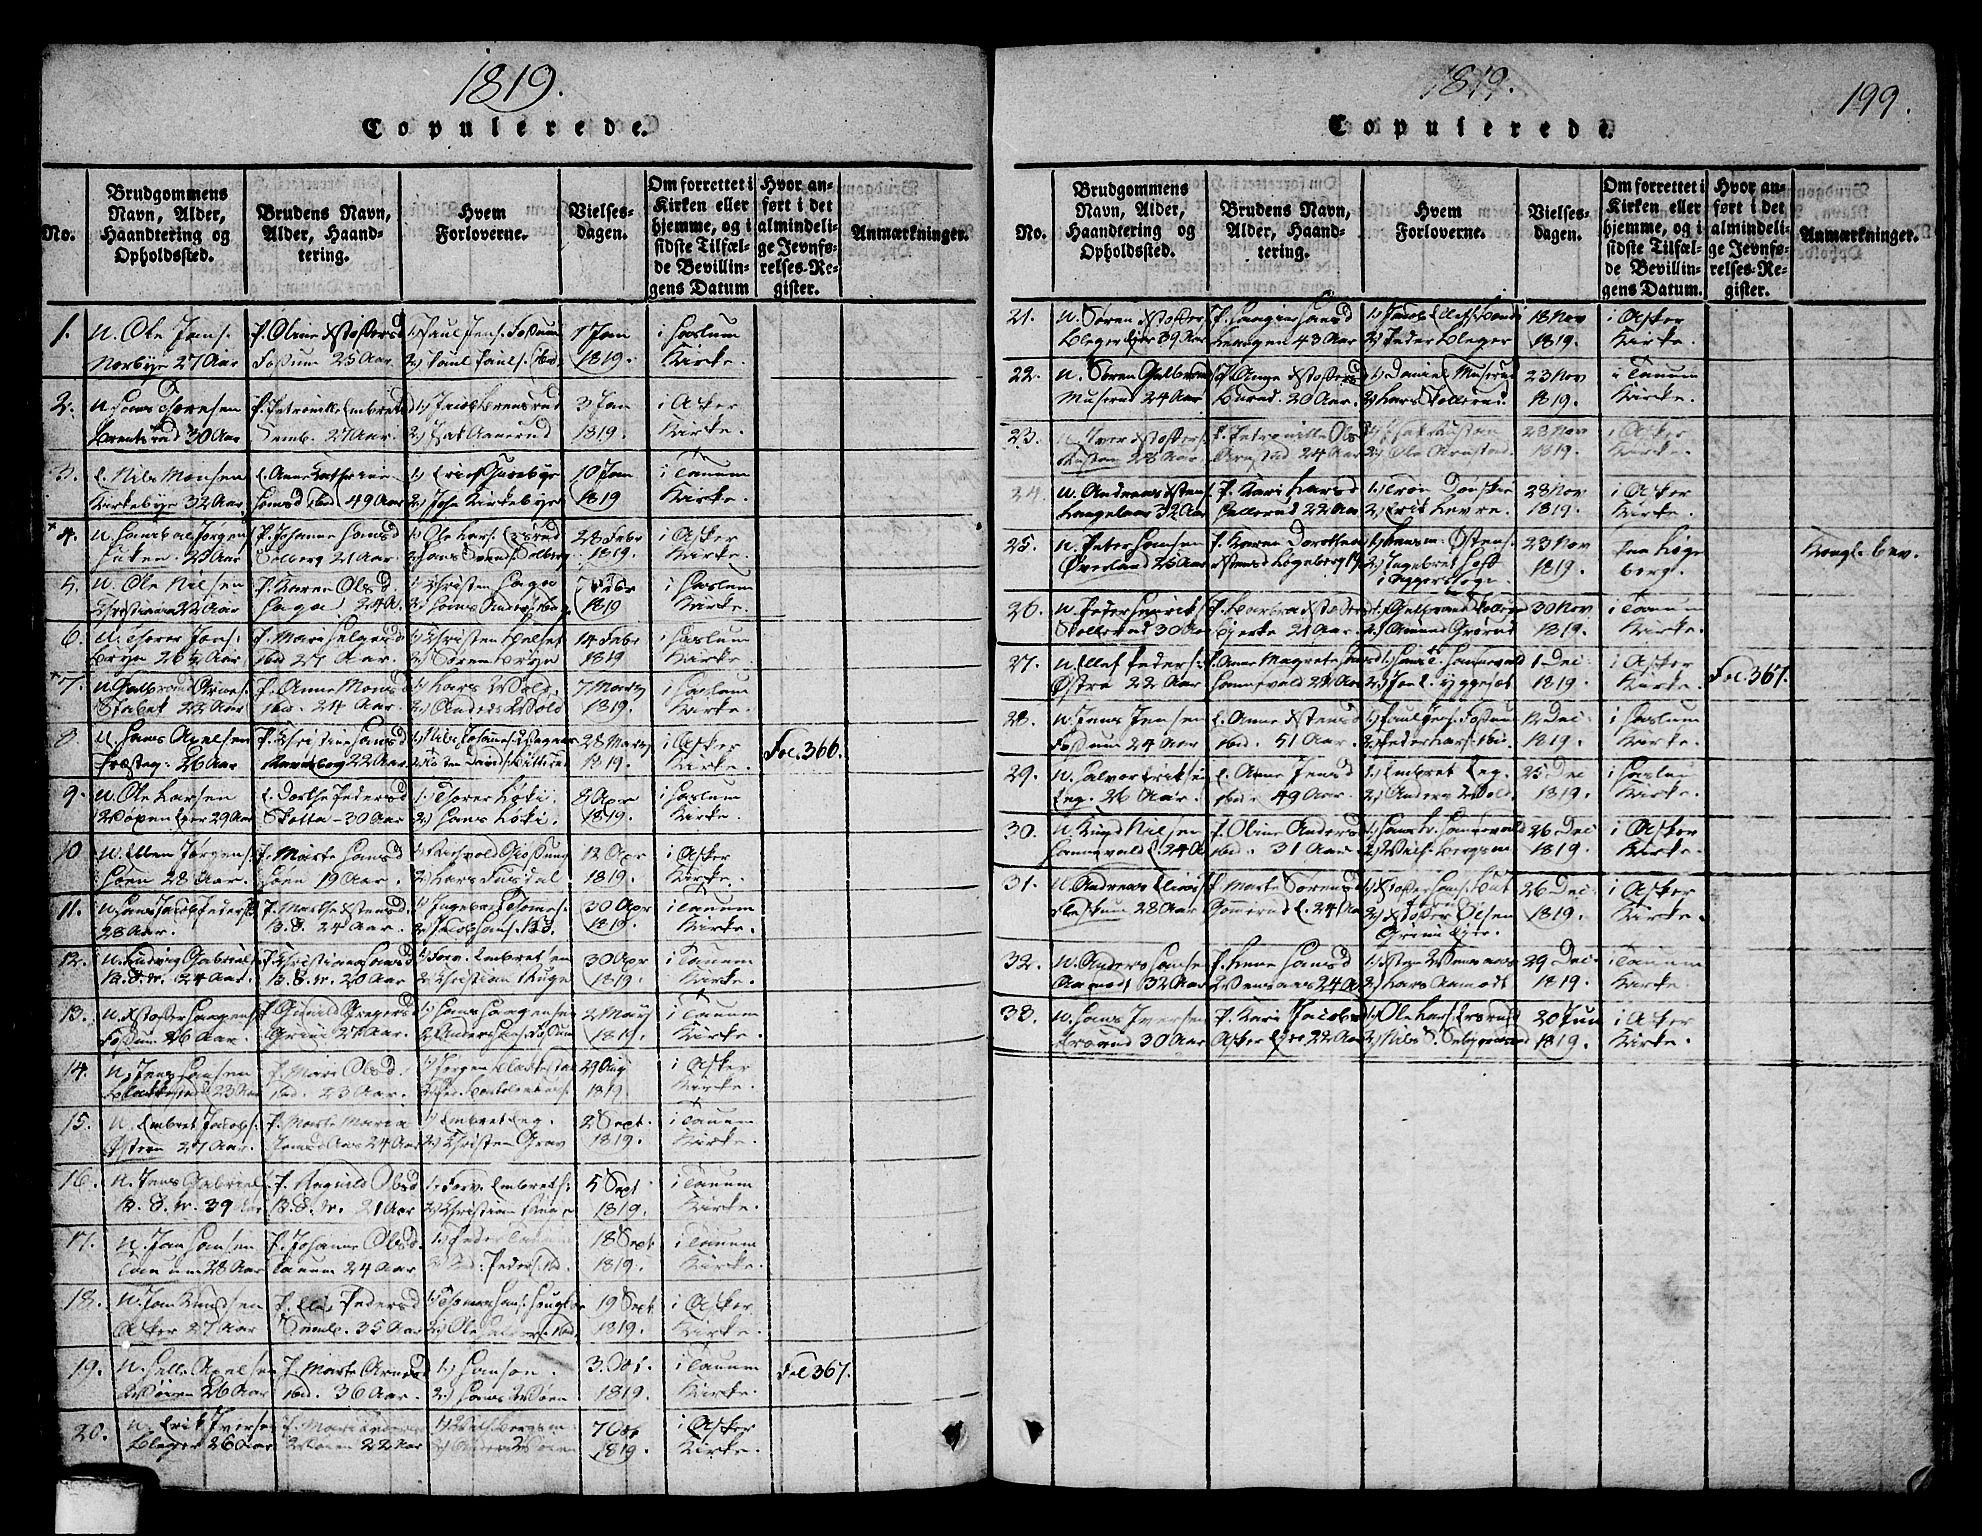 SAO, Asker prestekontor Kirkebøker, G/Ga/L0001: Klokkerbok nr. I 1, 1814-1830, s. 199